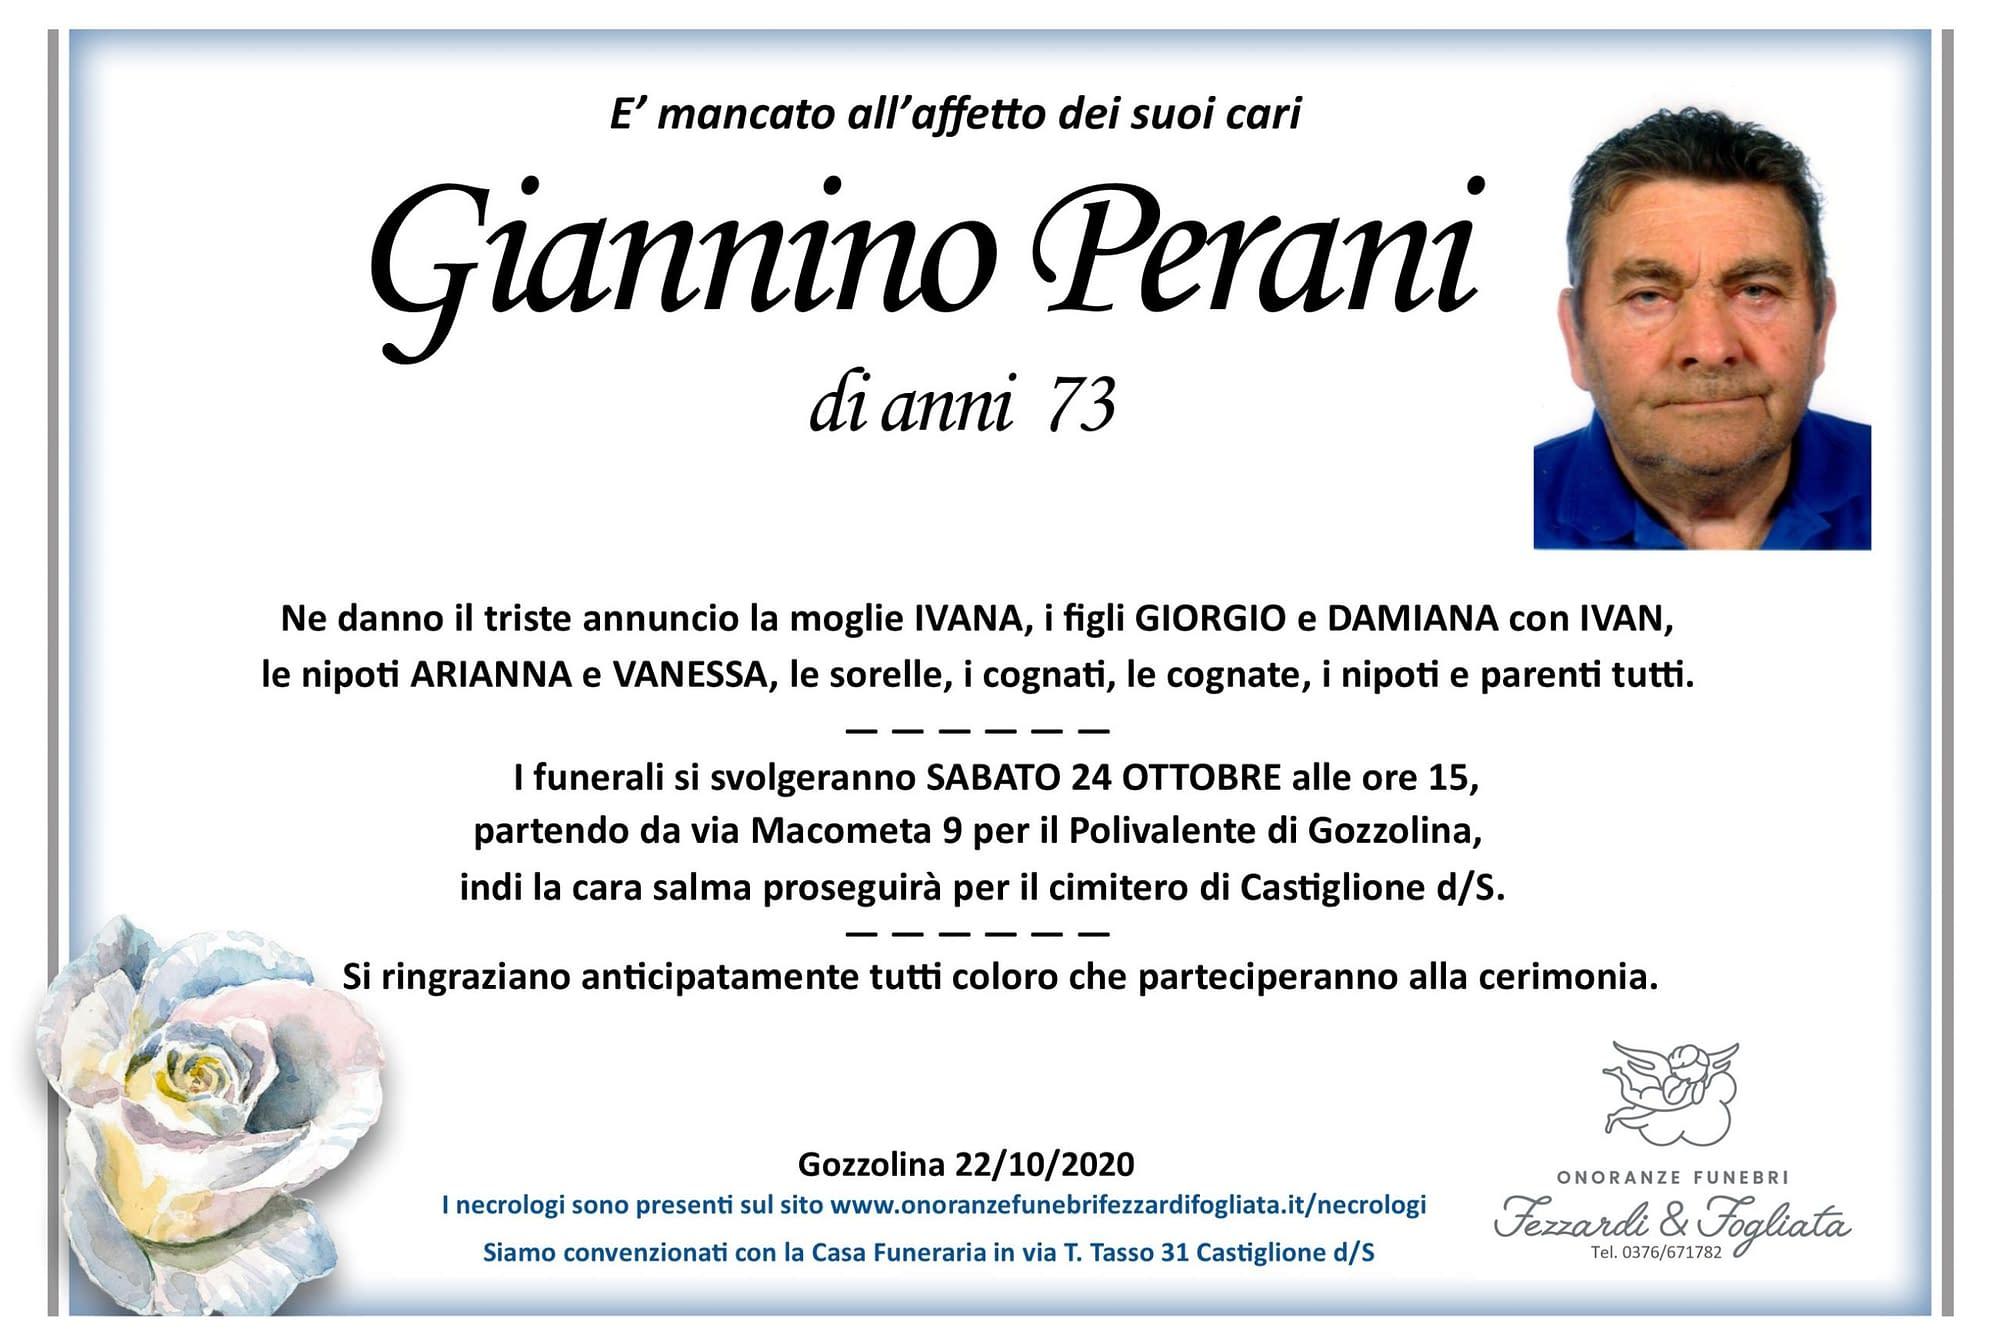 Necrologio Giannino Perani